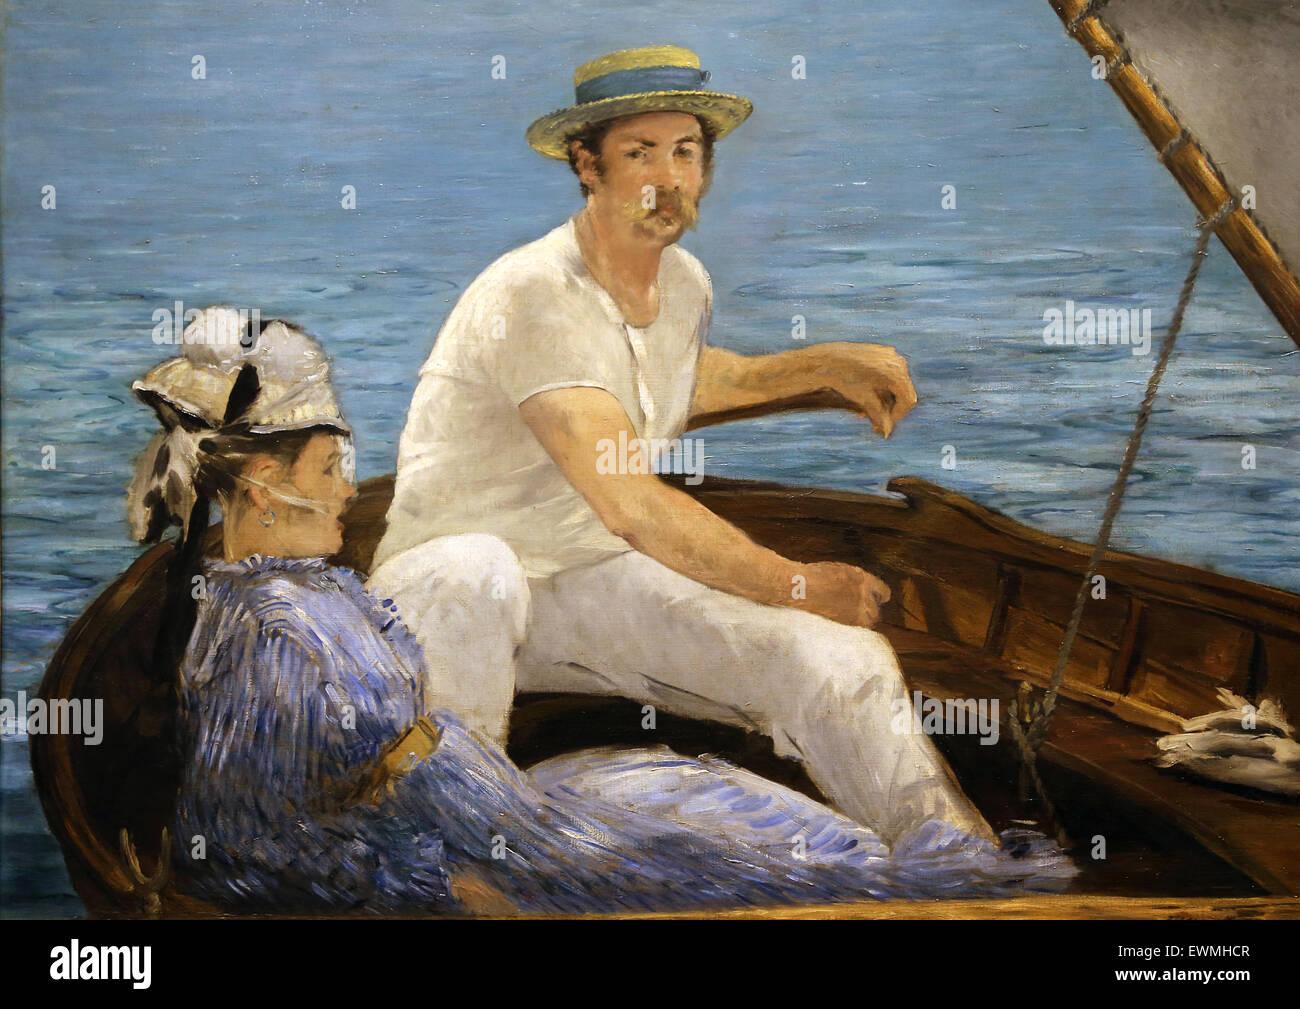 Edouard Manet (1832-1883). Pittore Francese. La nautica, 1874. Olio su tela. Metropolitan Museum of Art. Ny. Stati Immagini Stock